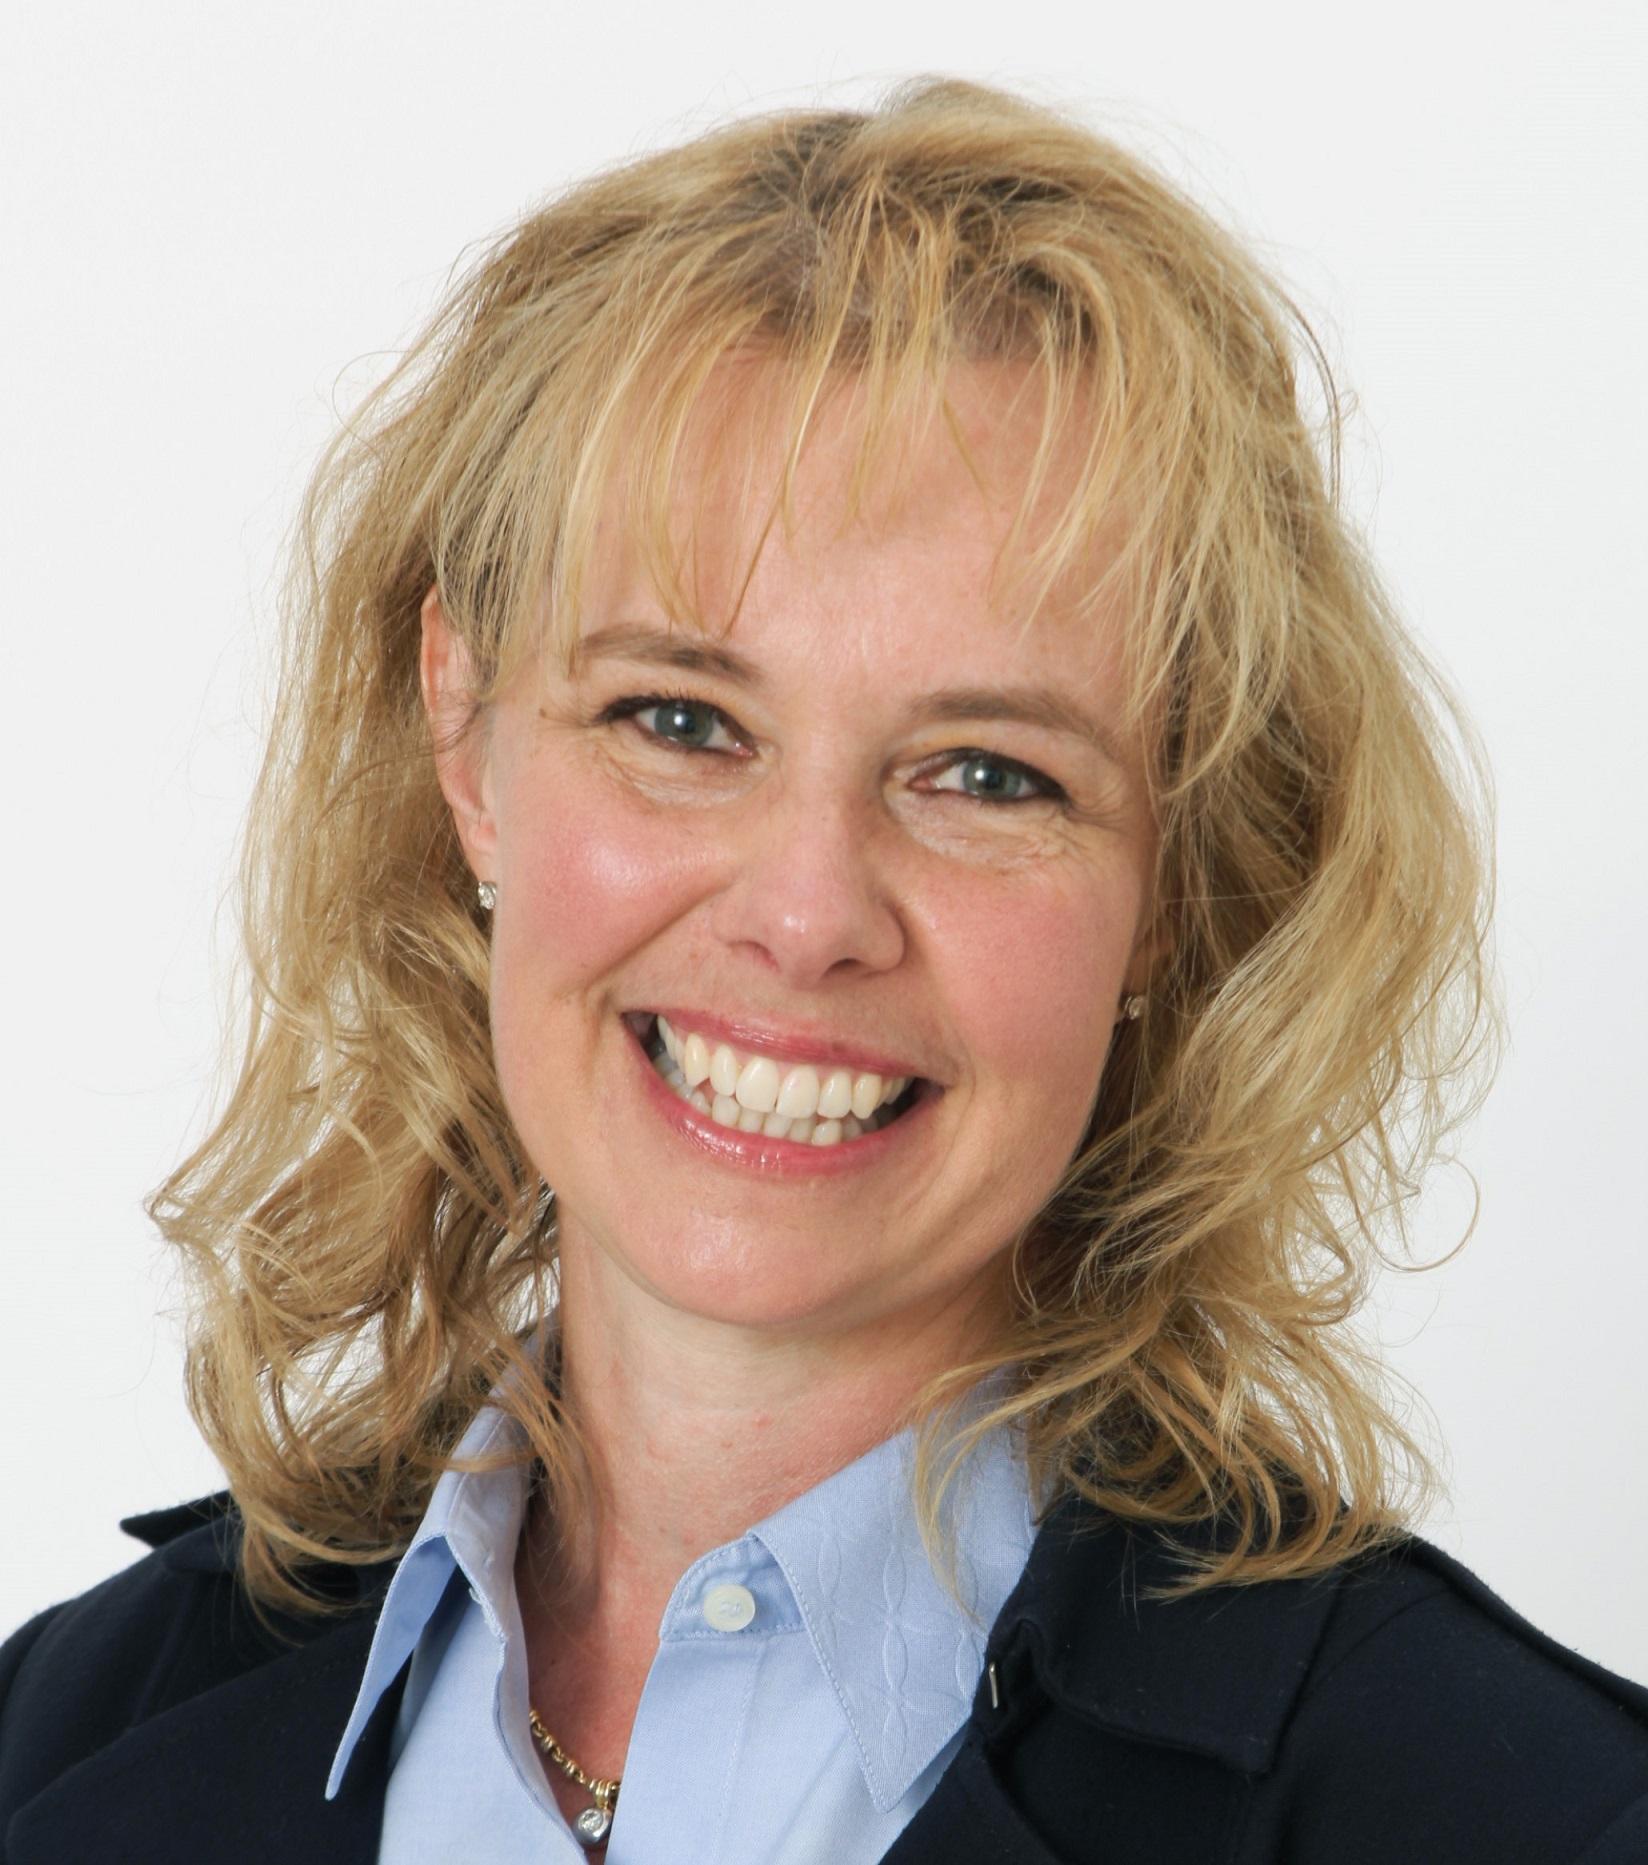 Cadenza Innovation_Christina Lampe-Onnerud Headshot